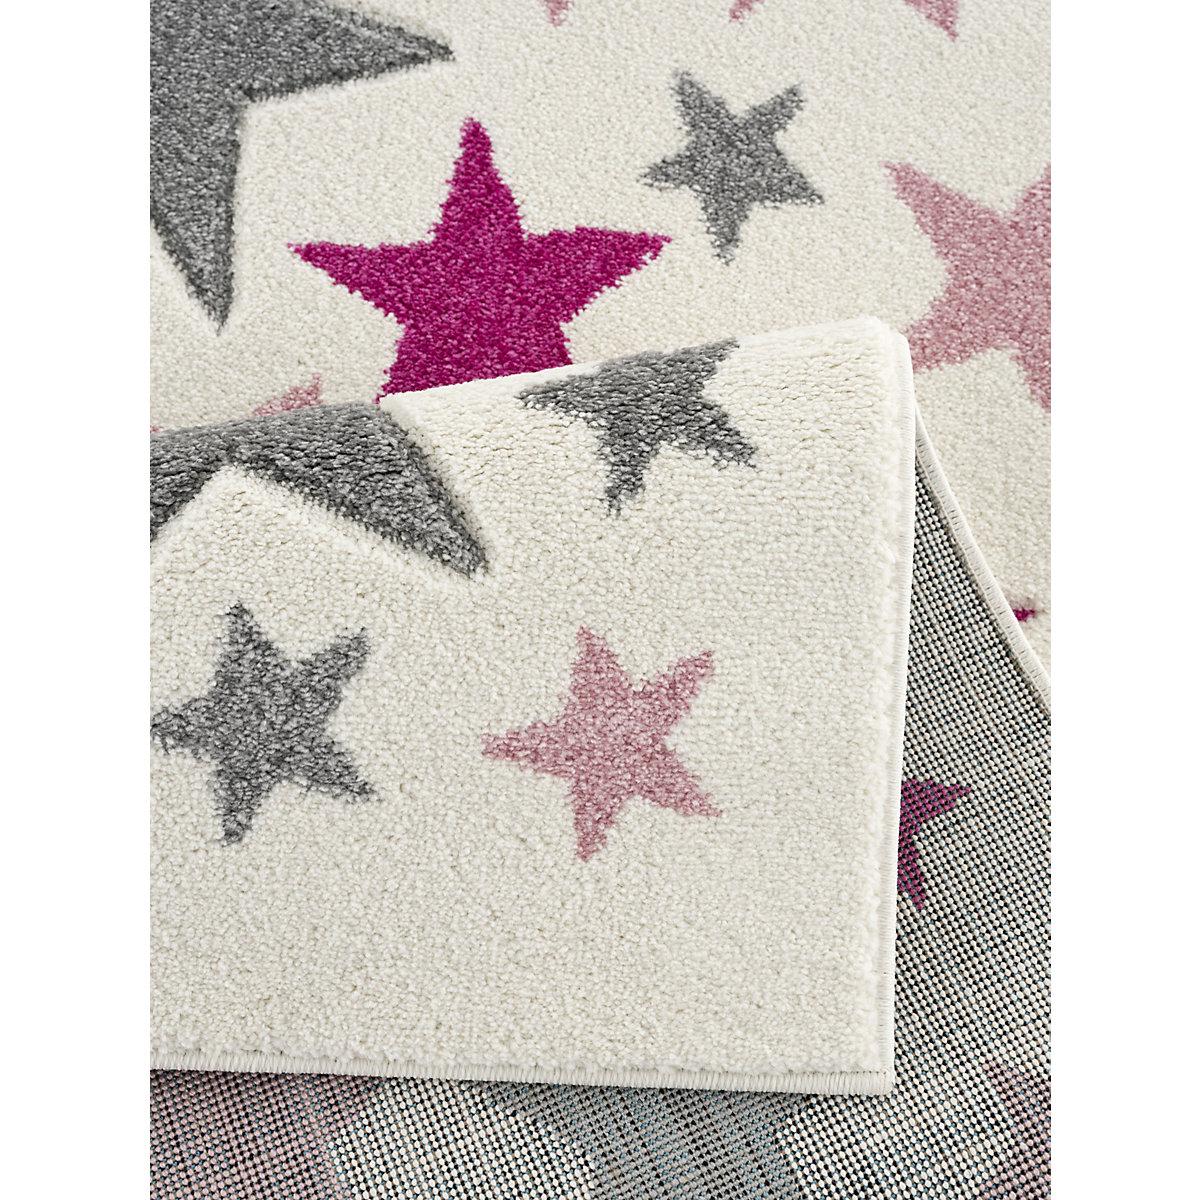 Kinderteppich STELLA creme/silbergrau-rosa 120 x 180 cm Happy Rugs lrBE8